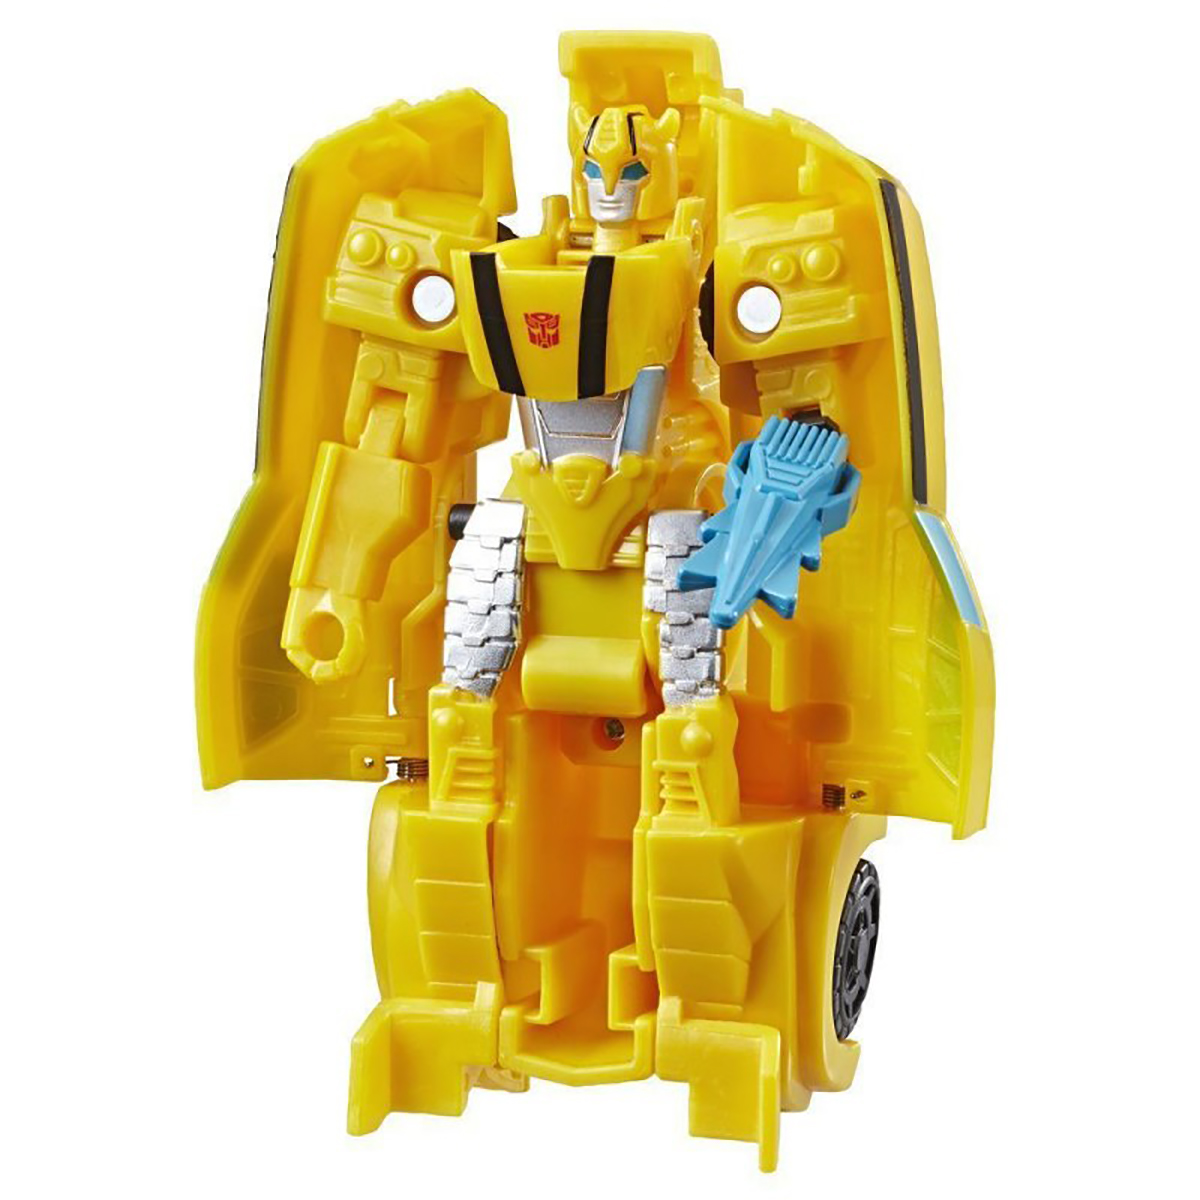 Figurina Transformers Cyberverse, Bumblebee E3642